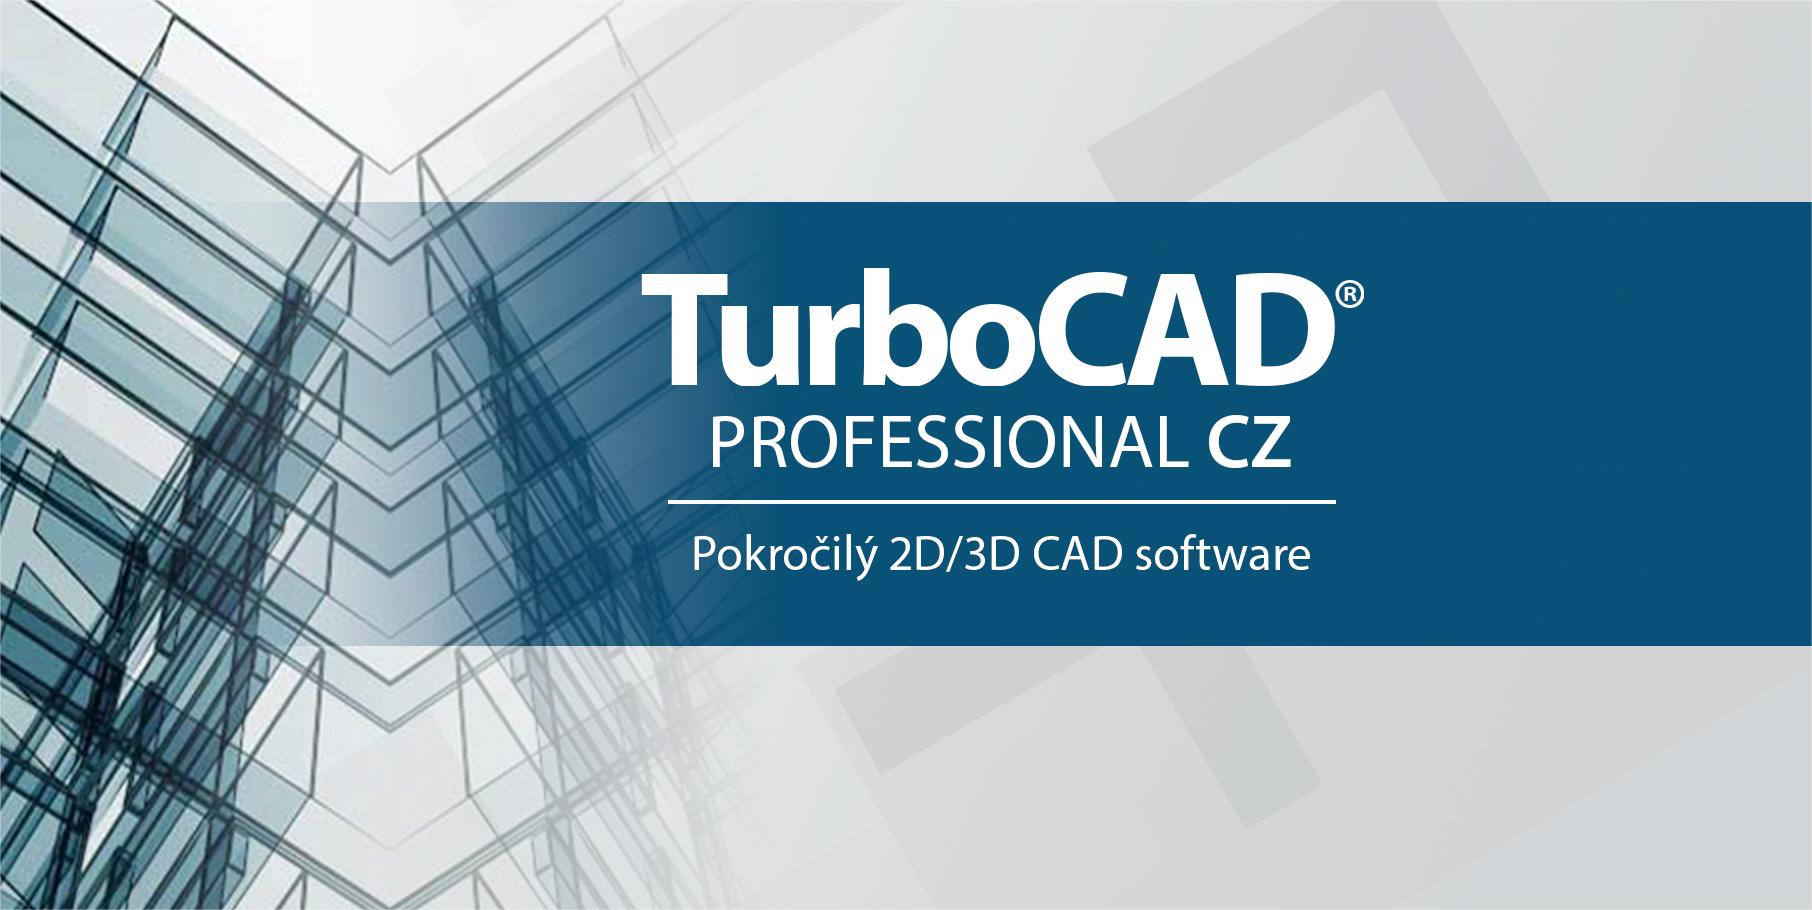 TurboCAD Professional CAD od SPINAR software pro 2D 3D kresleni vizualizaci - TurboCAD Pro 2D/3D 27 CZ